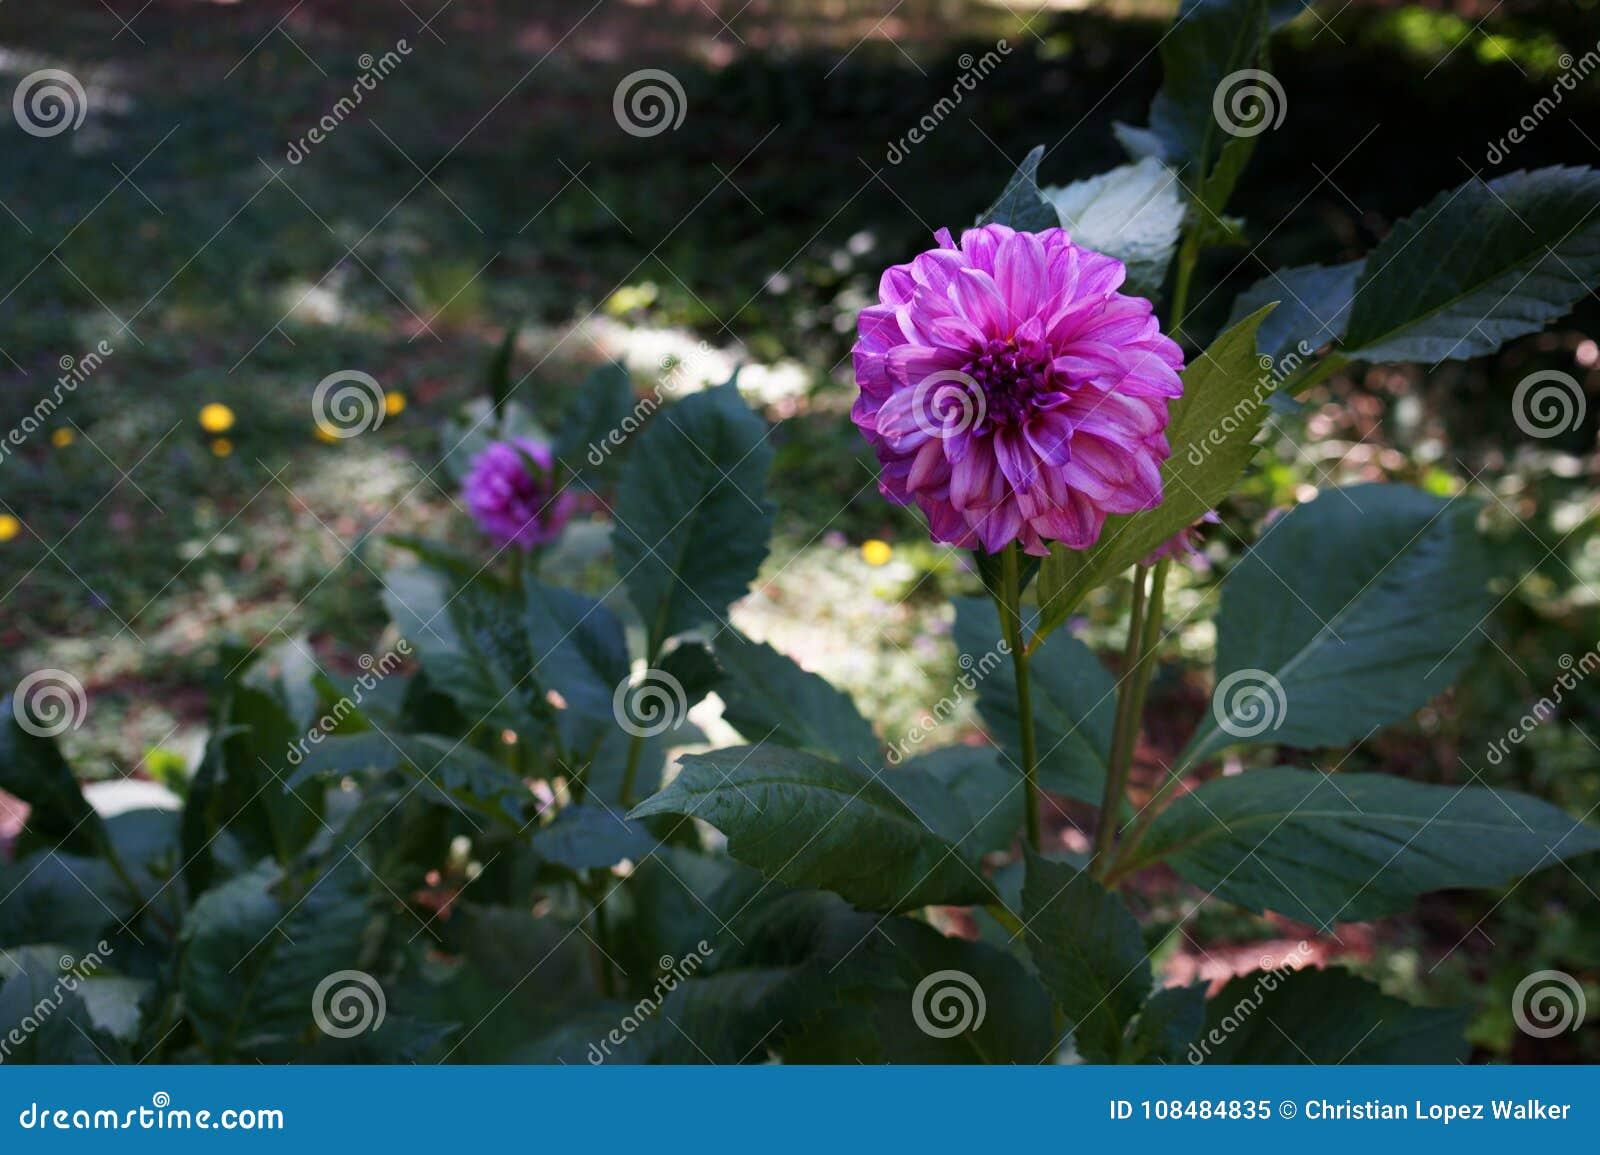 Purple dahlia flower in a green garden stock image image of download purple dahlia flower in a green garden stock image image of morning attached izmirmasajfo